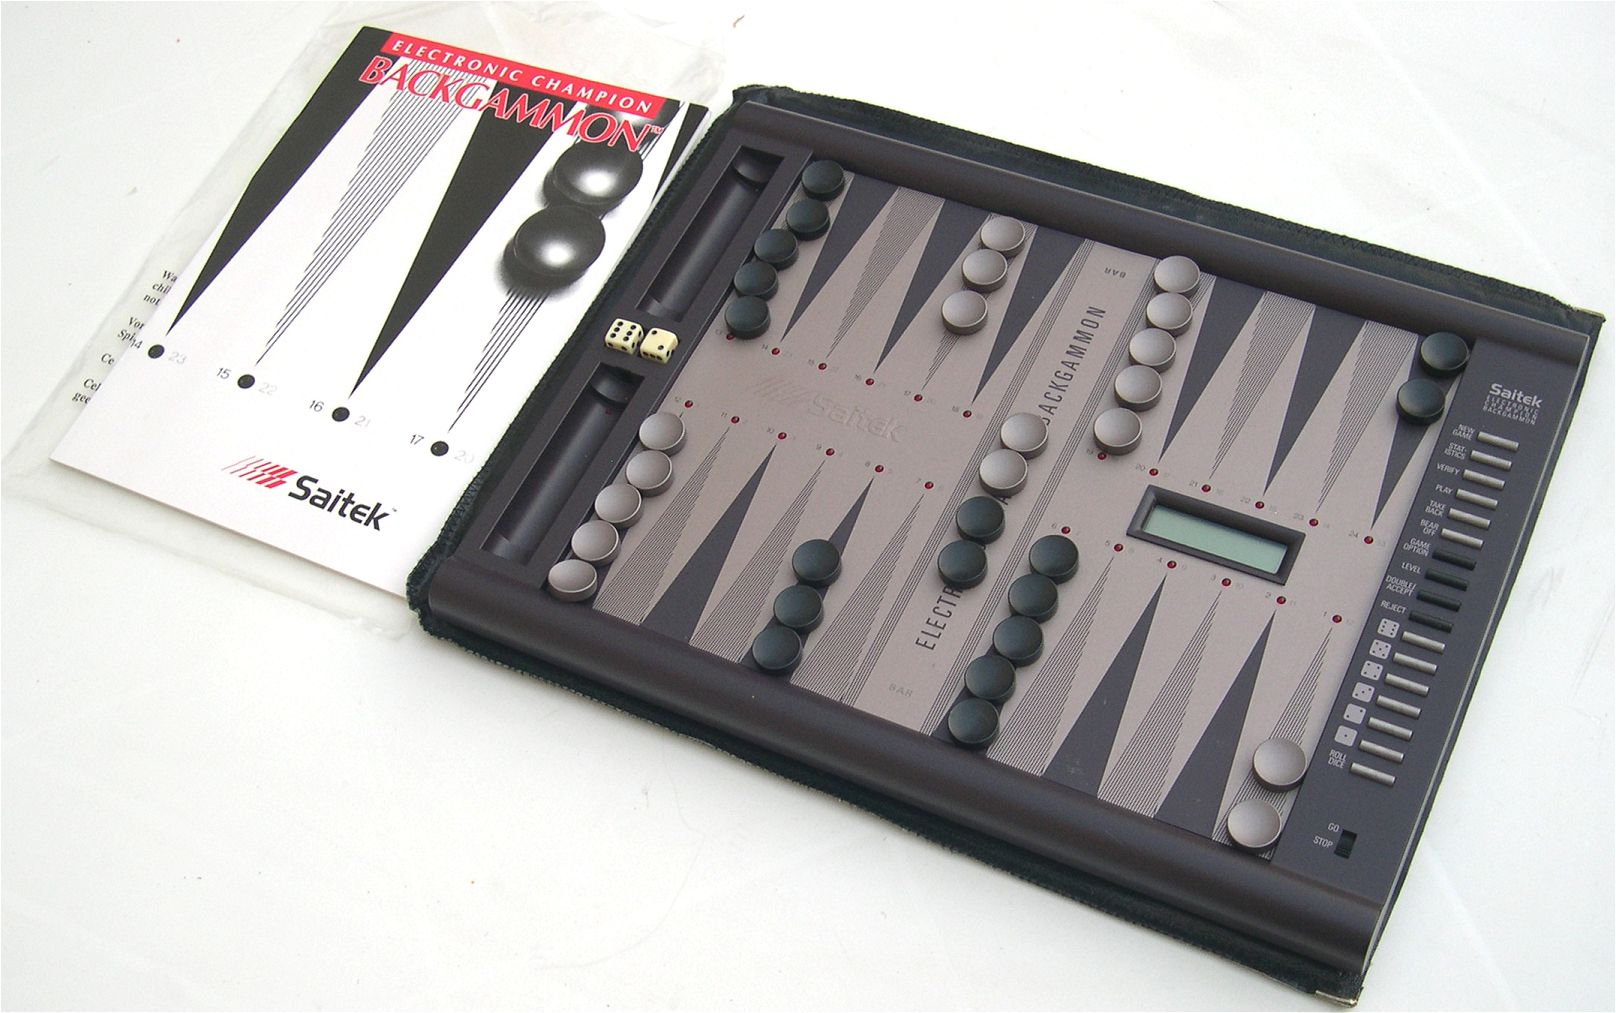 Backgammon Computer